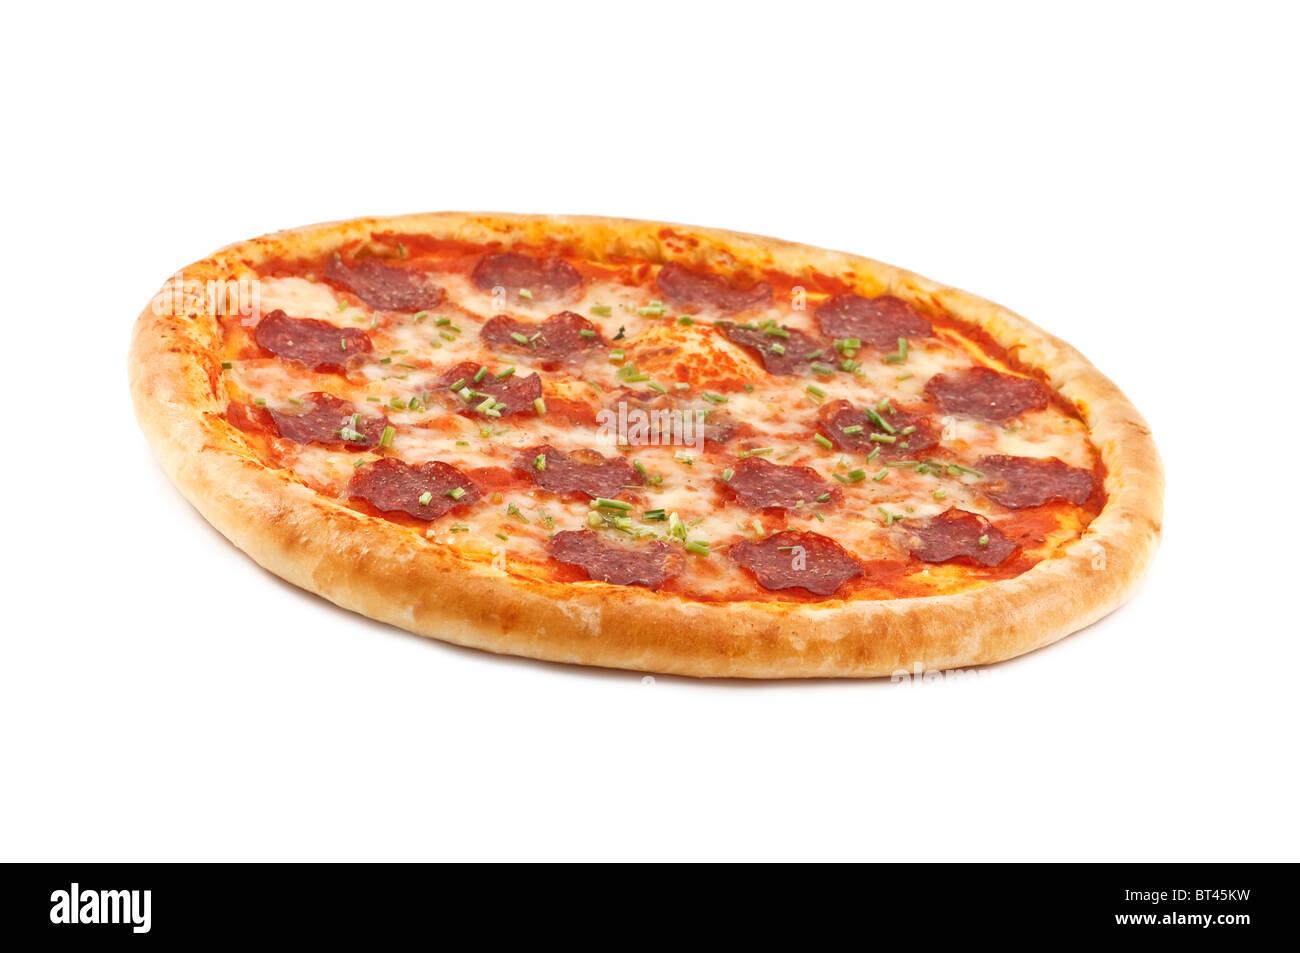 salami pizza isolated on white - Stock Image